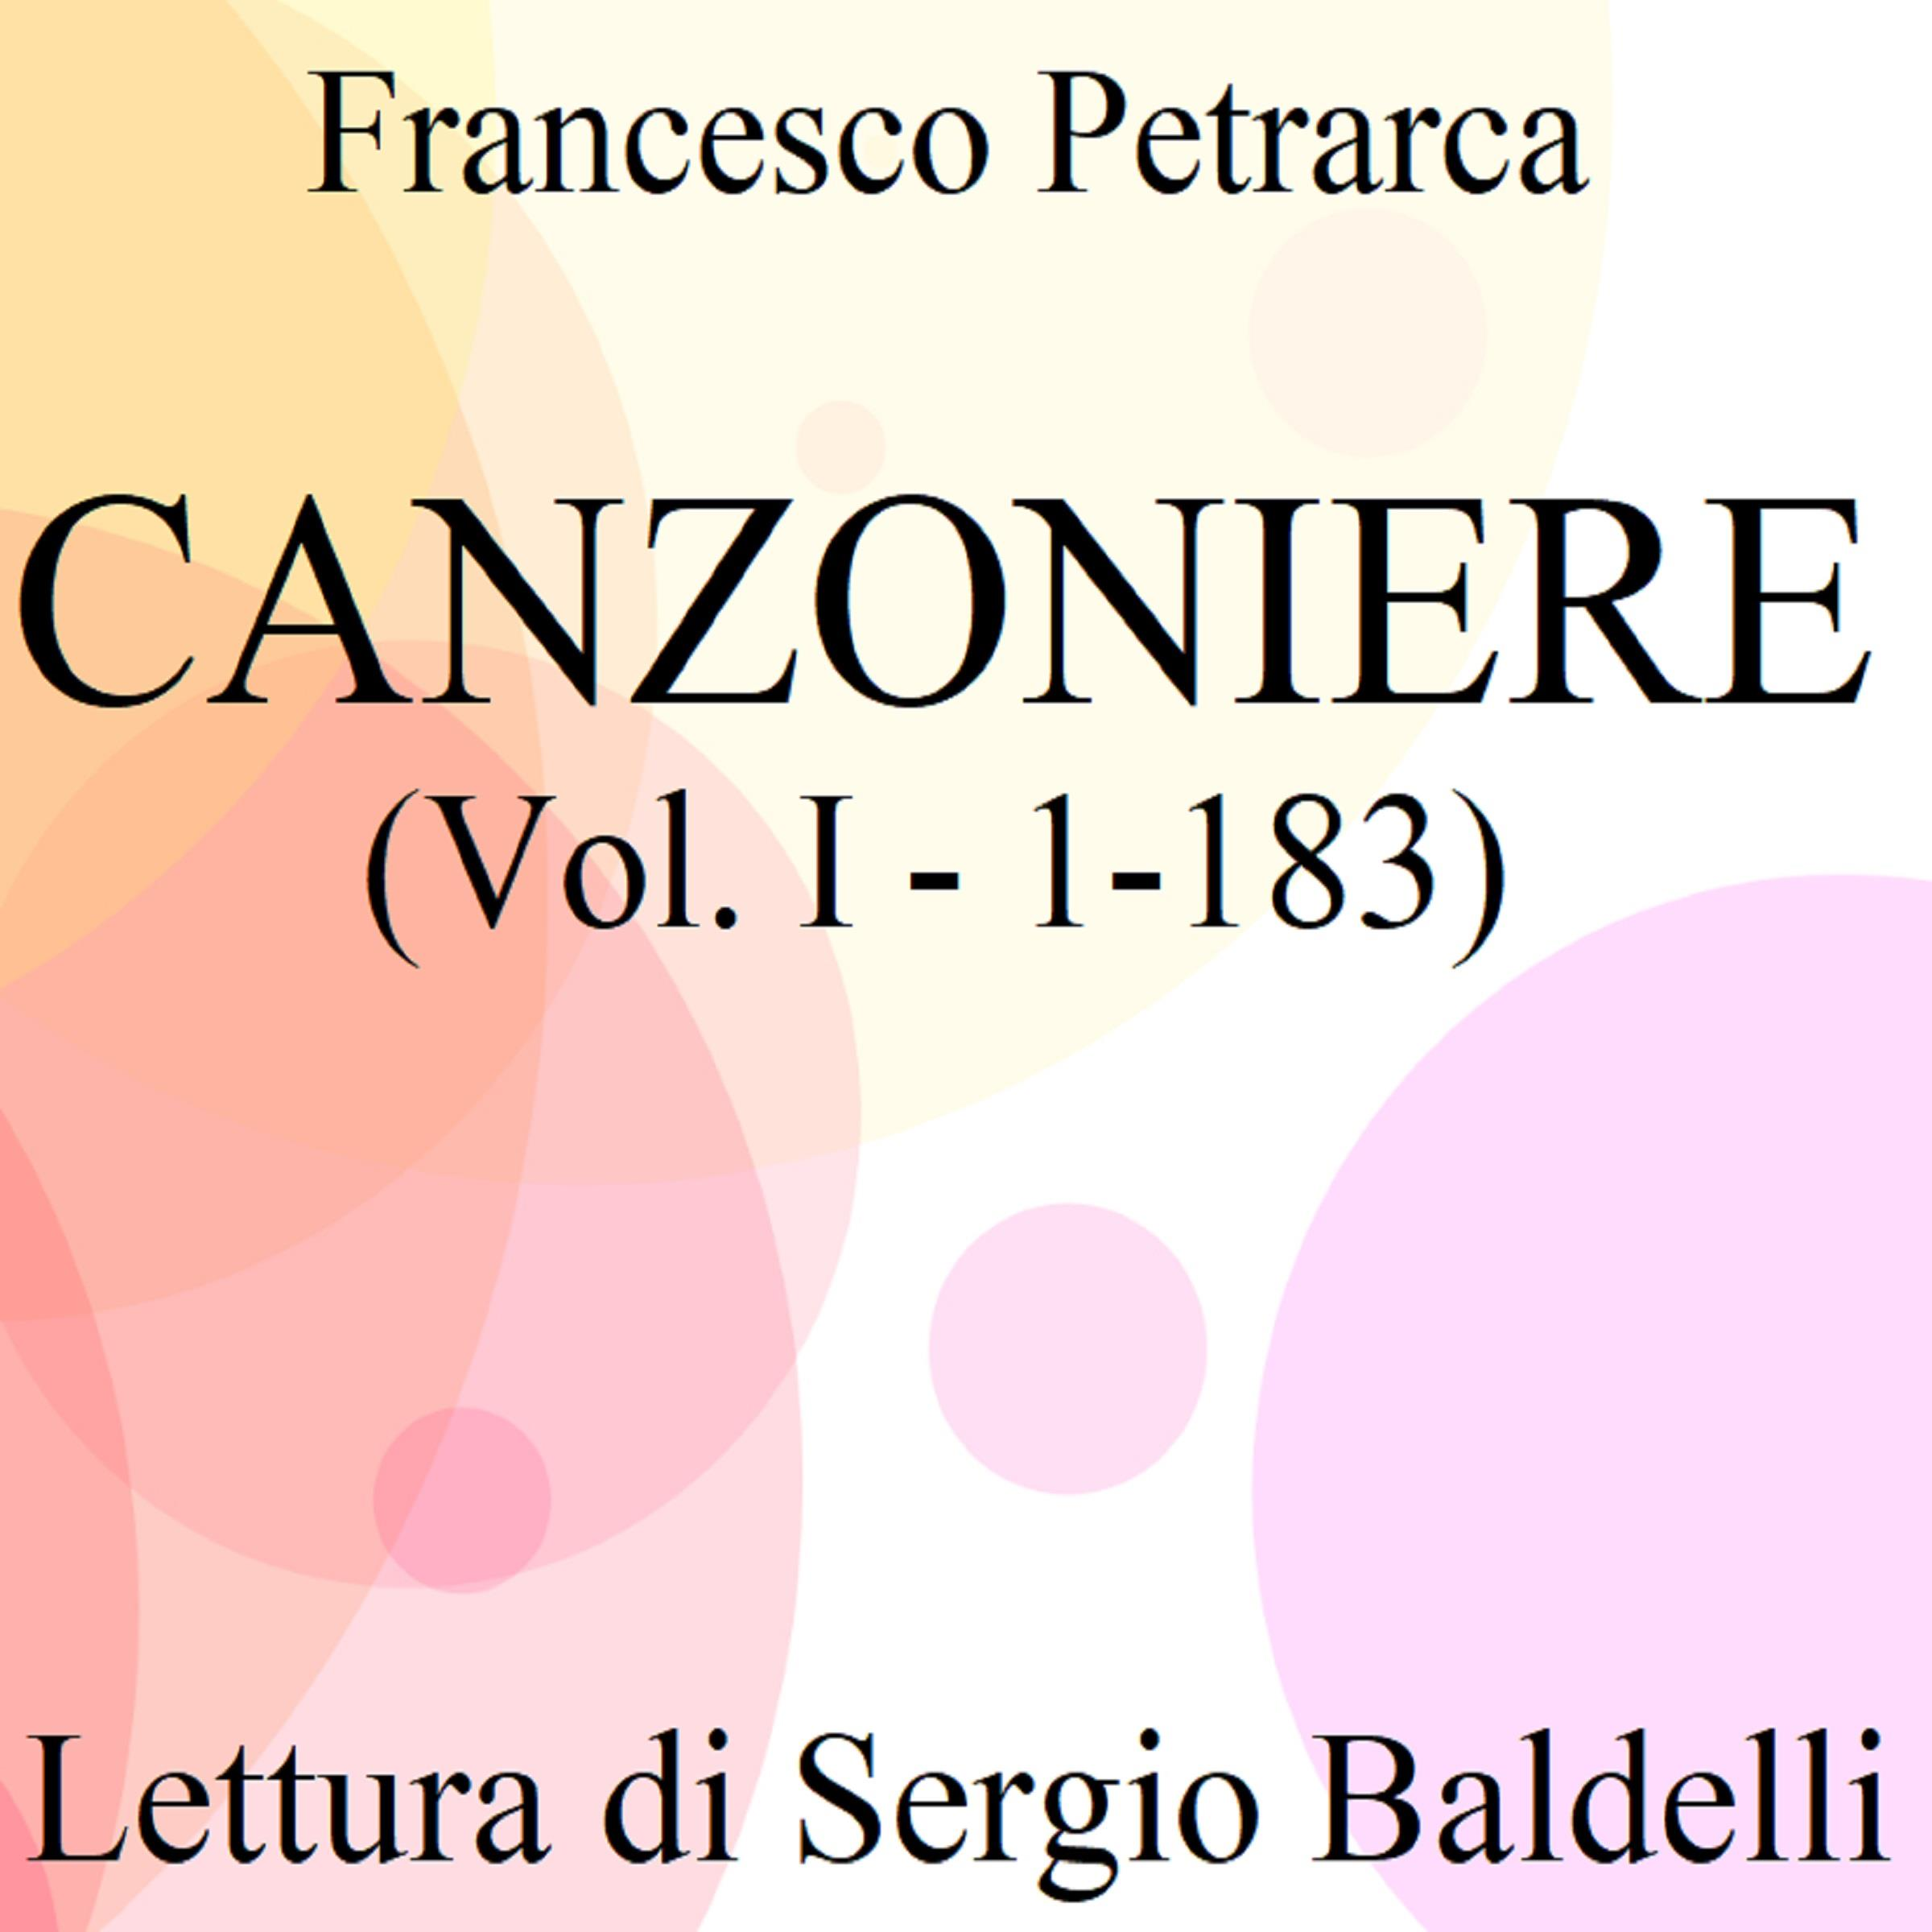 Canzoniere vol. I (1-183)